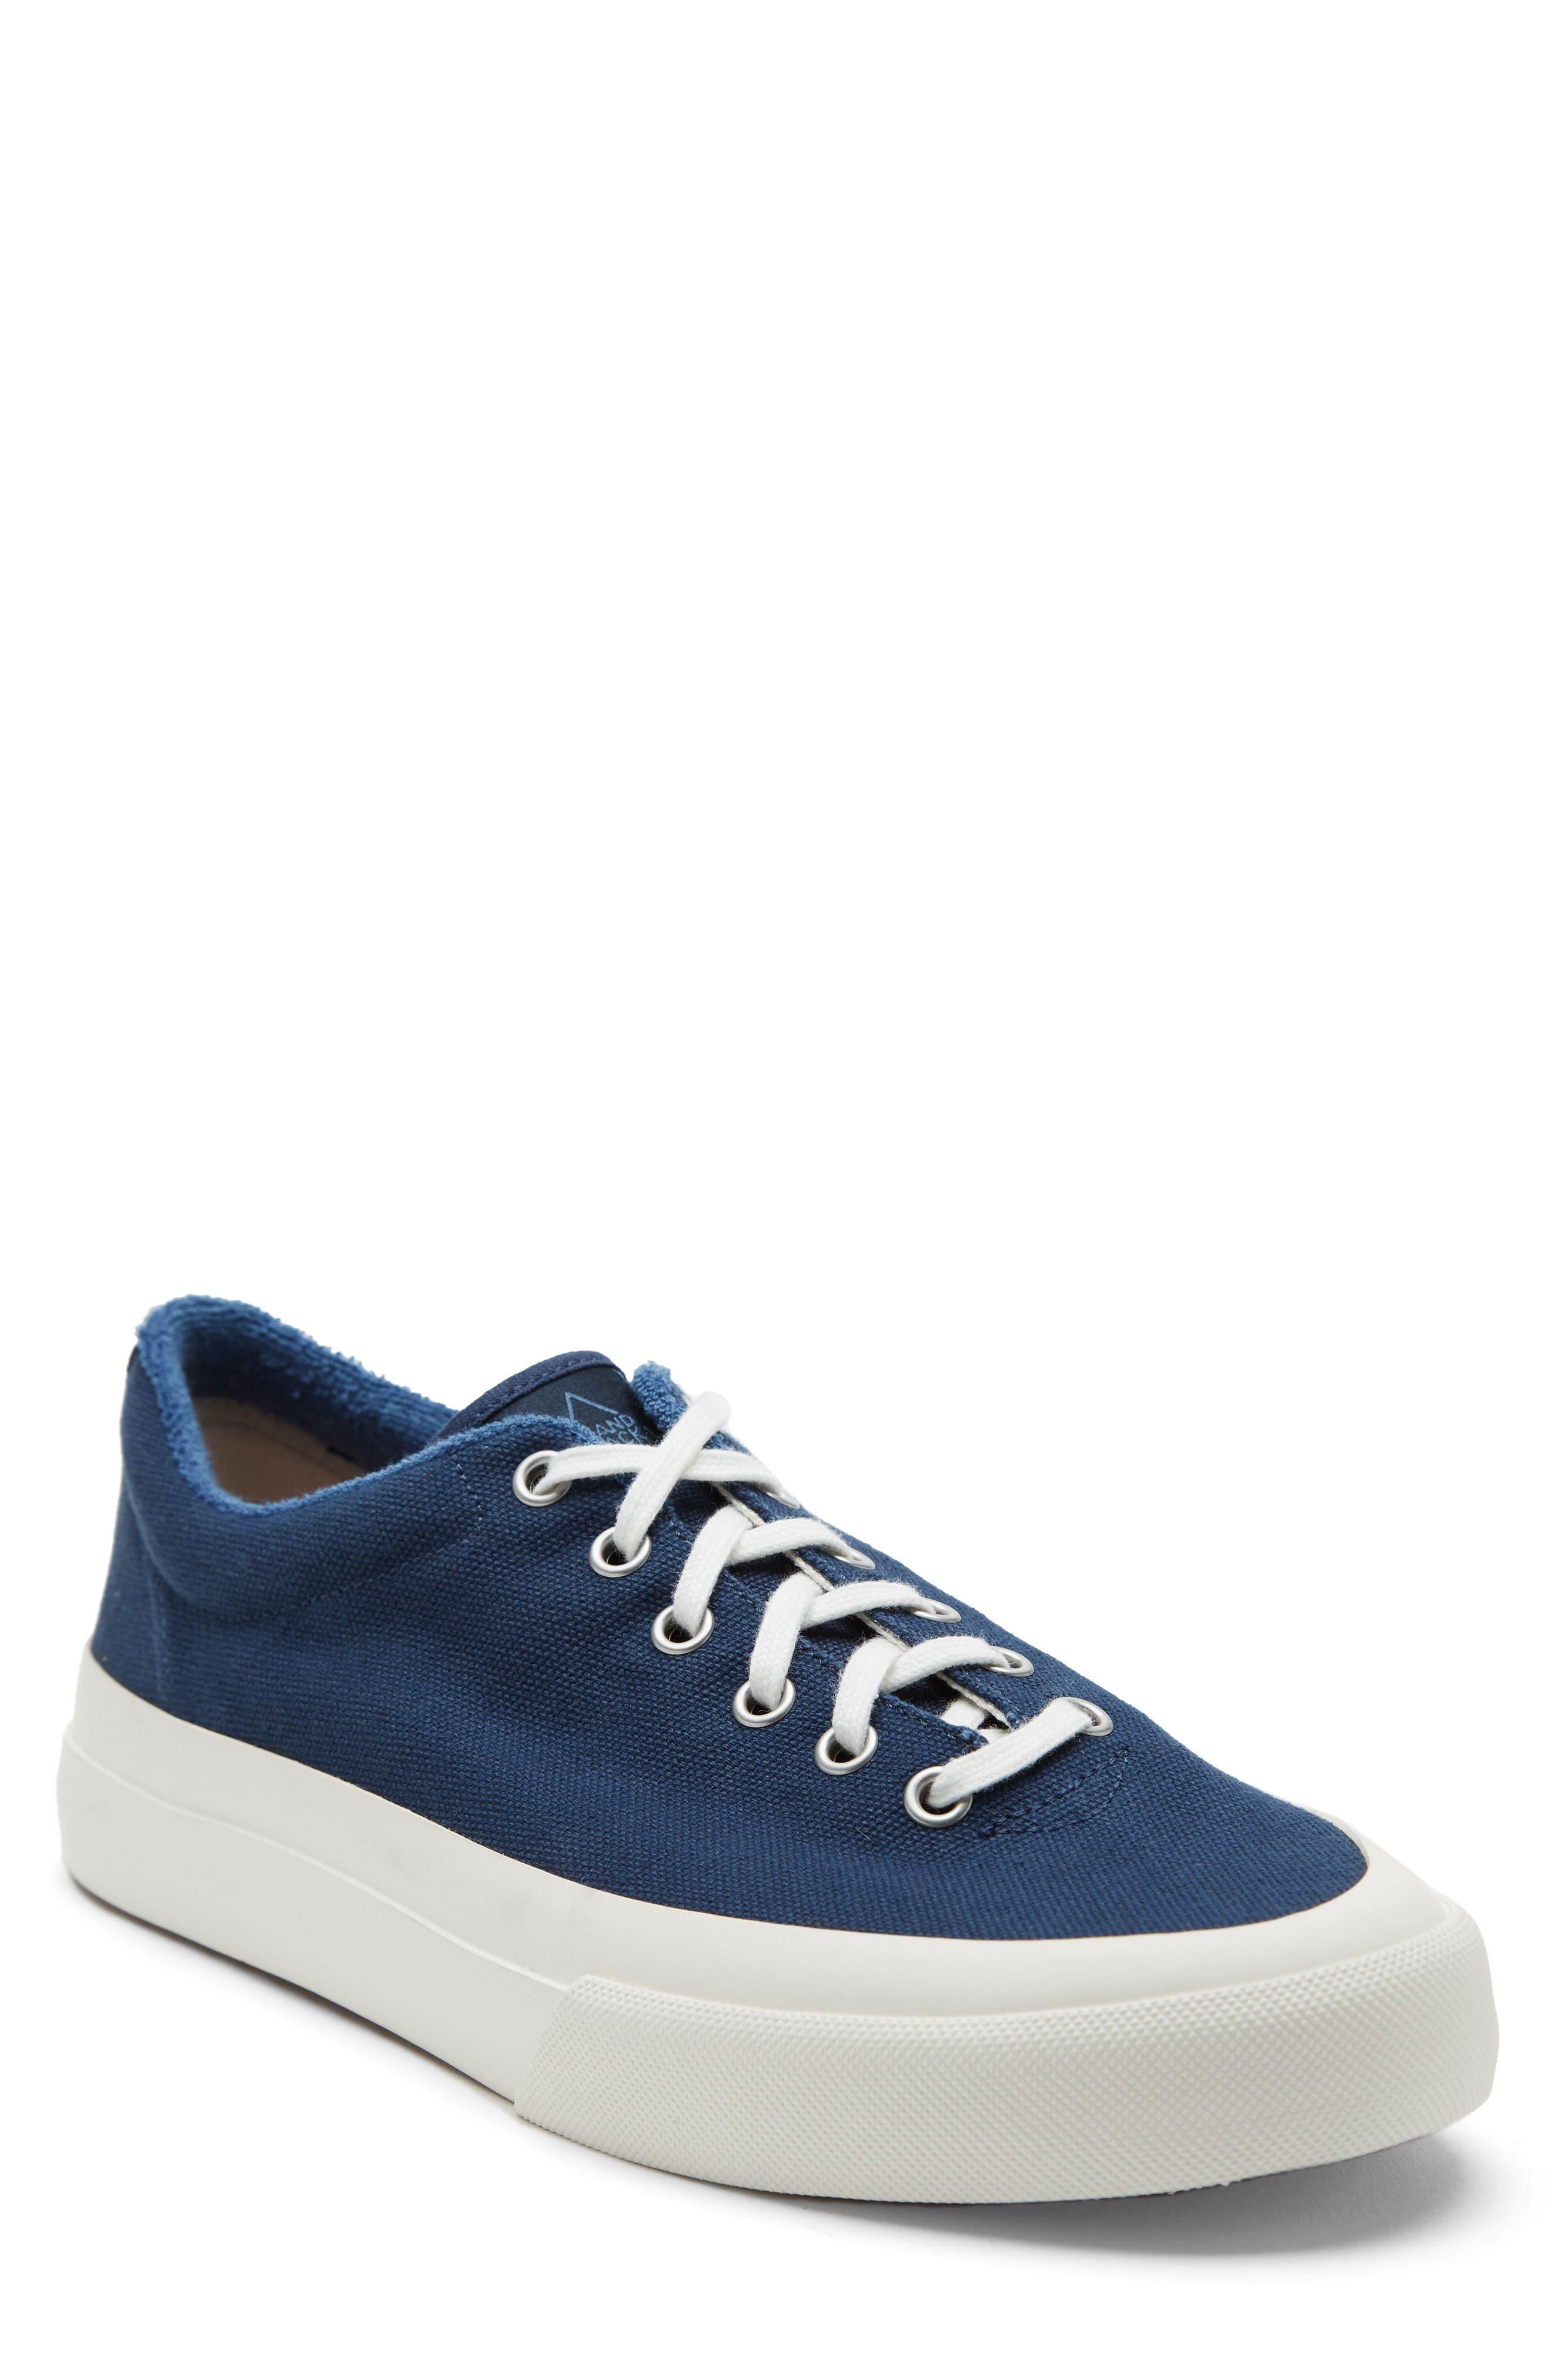 Vesta Low Top Sneaker,                             Main thumbnail 1, color,                             Navy